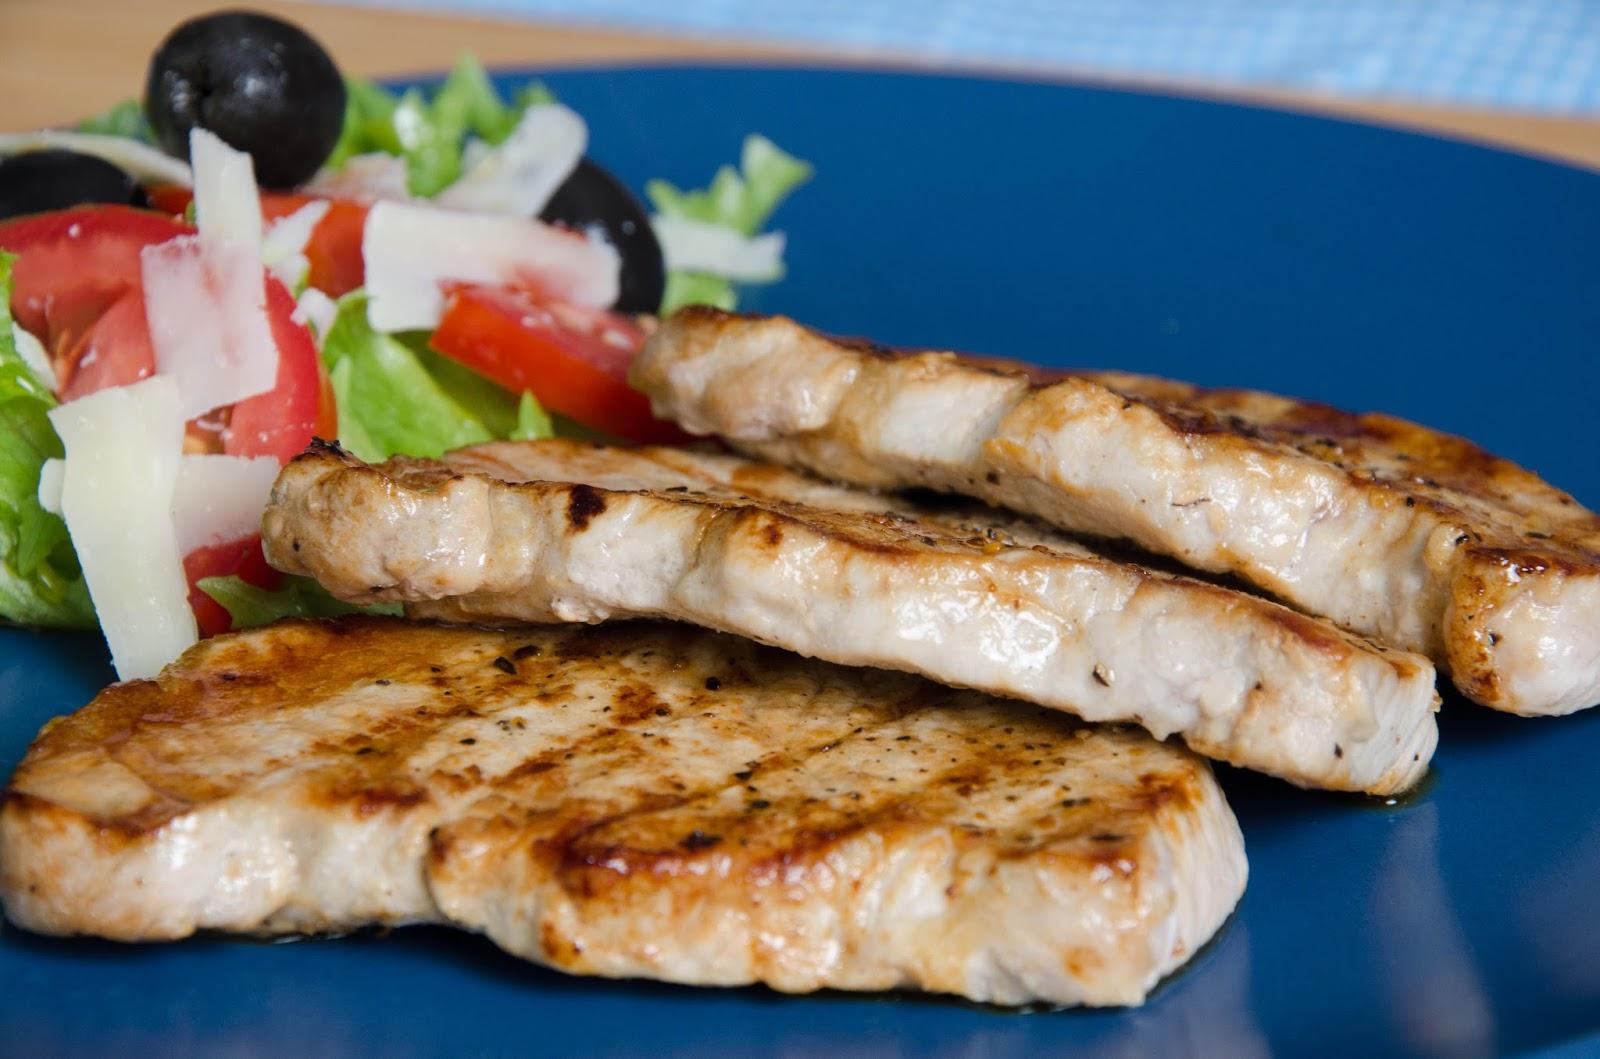 Pork chops - czyli kotlety schabowe z patelni grillowej